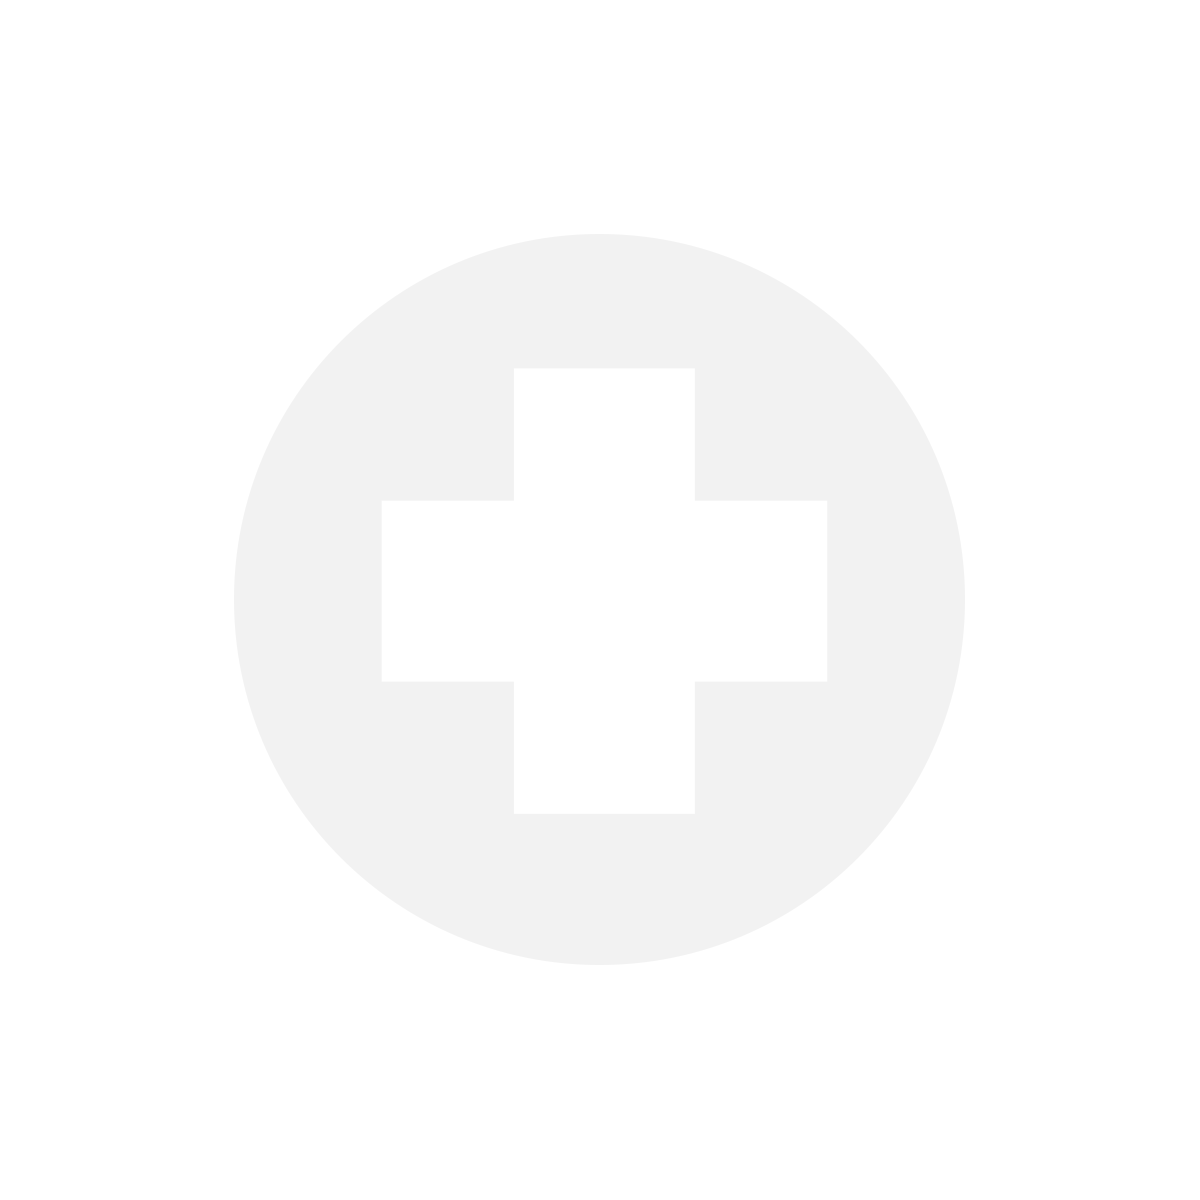 PHYSIOTHERAPIE.com Draps d'examen Micro gaufrés - 135 formats